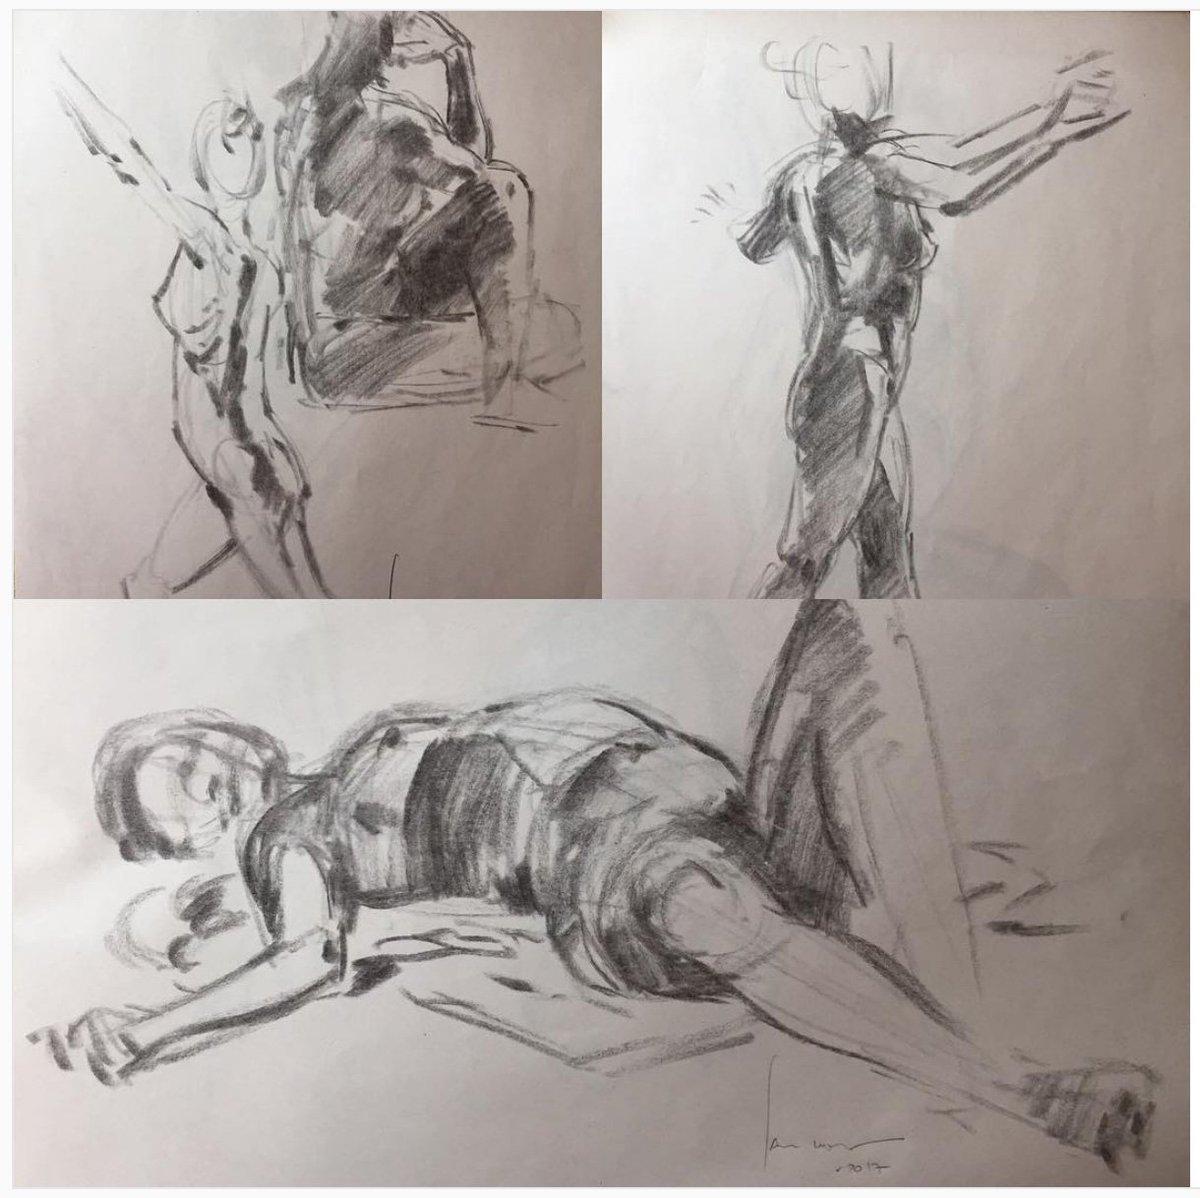 Sam Hart Ccxp Aaf14 On Twitter Anatomy Classes Axisvfxschool